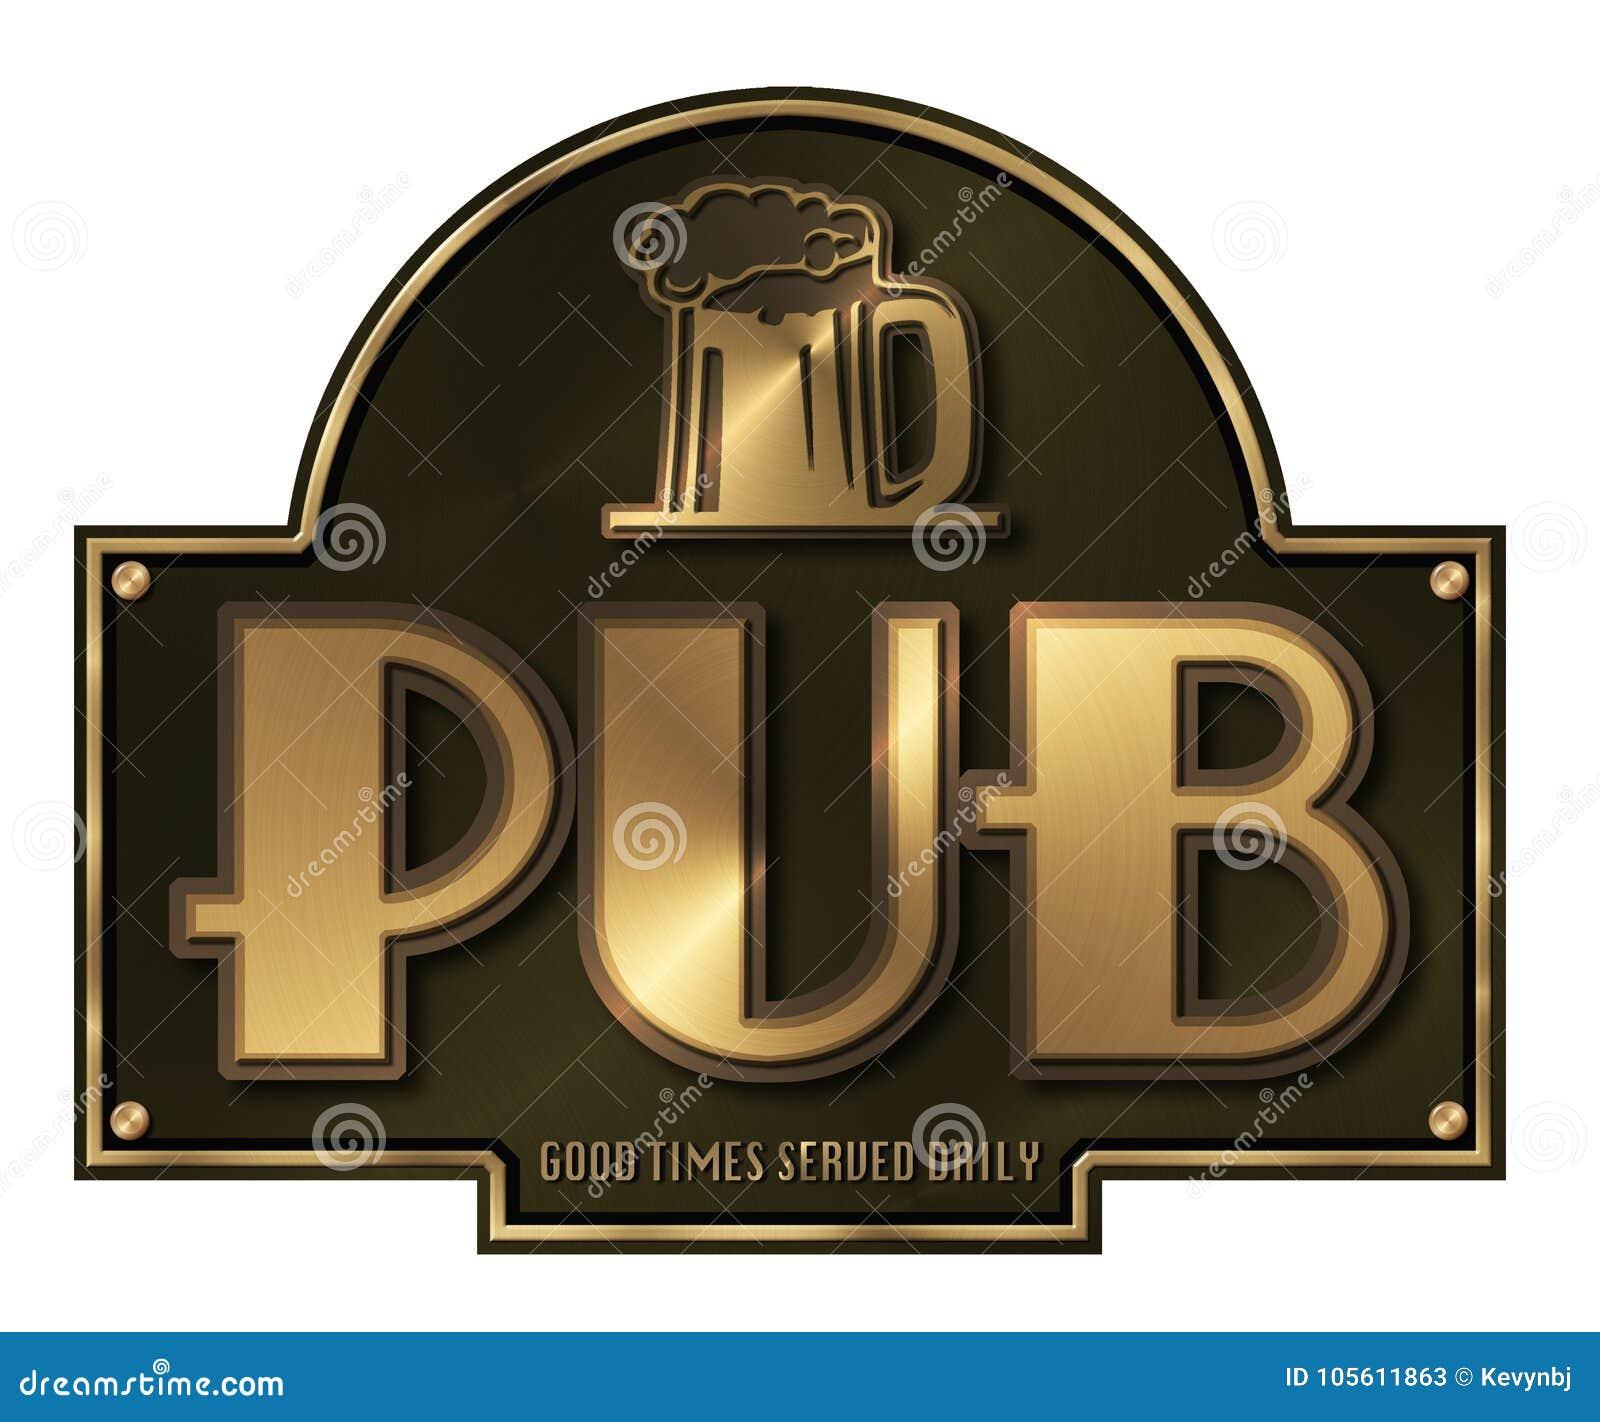 Pub sign Brass Plaque